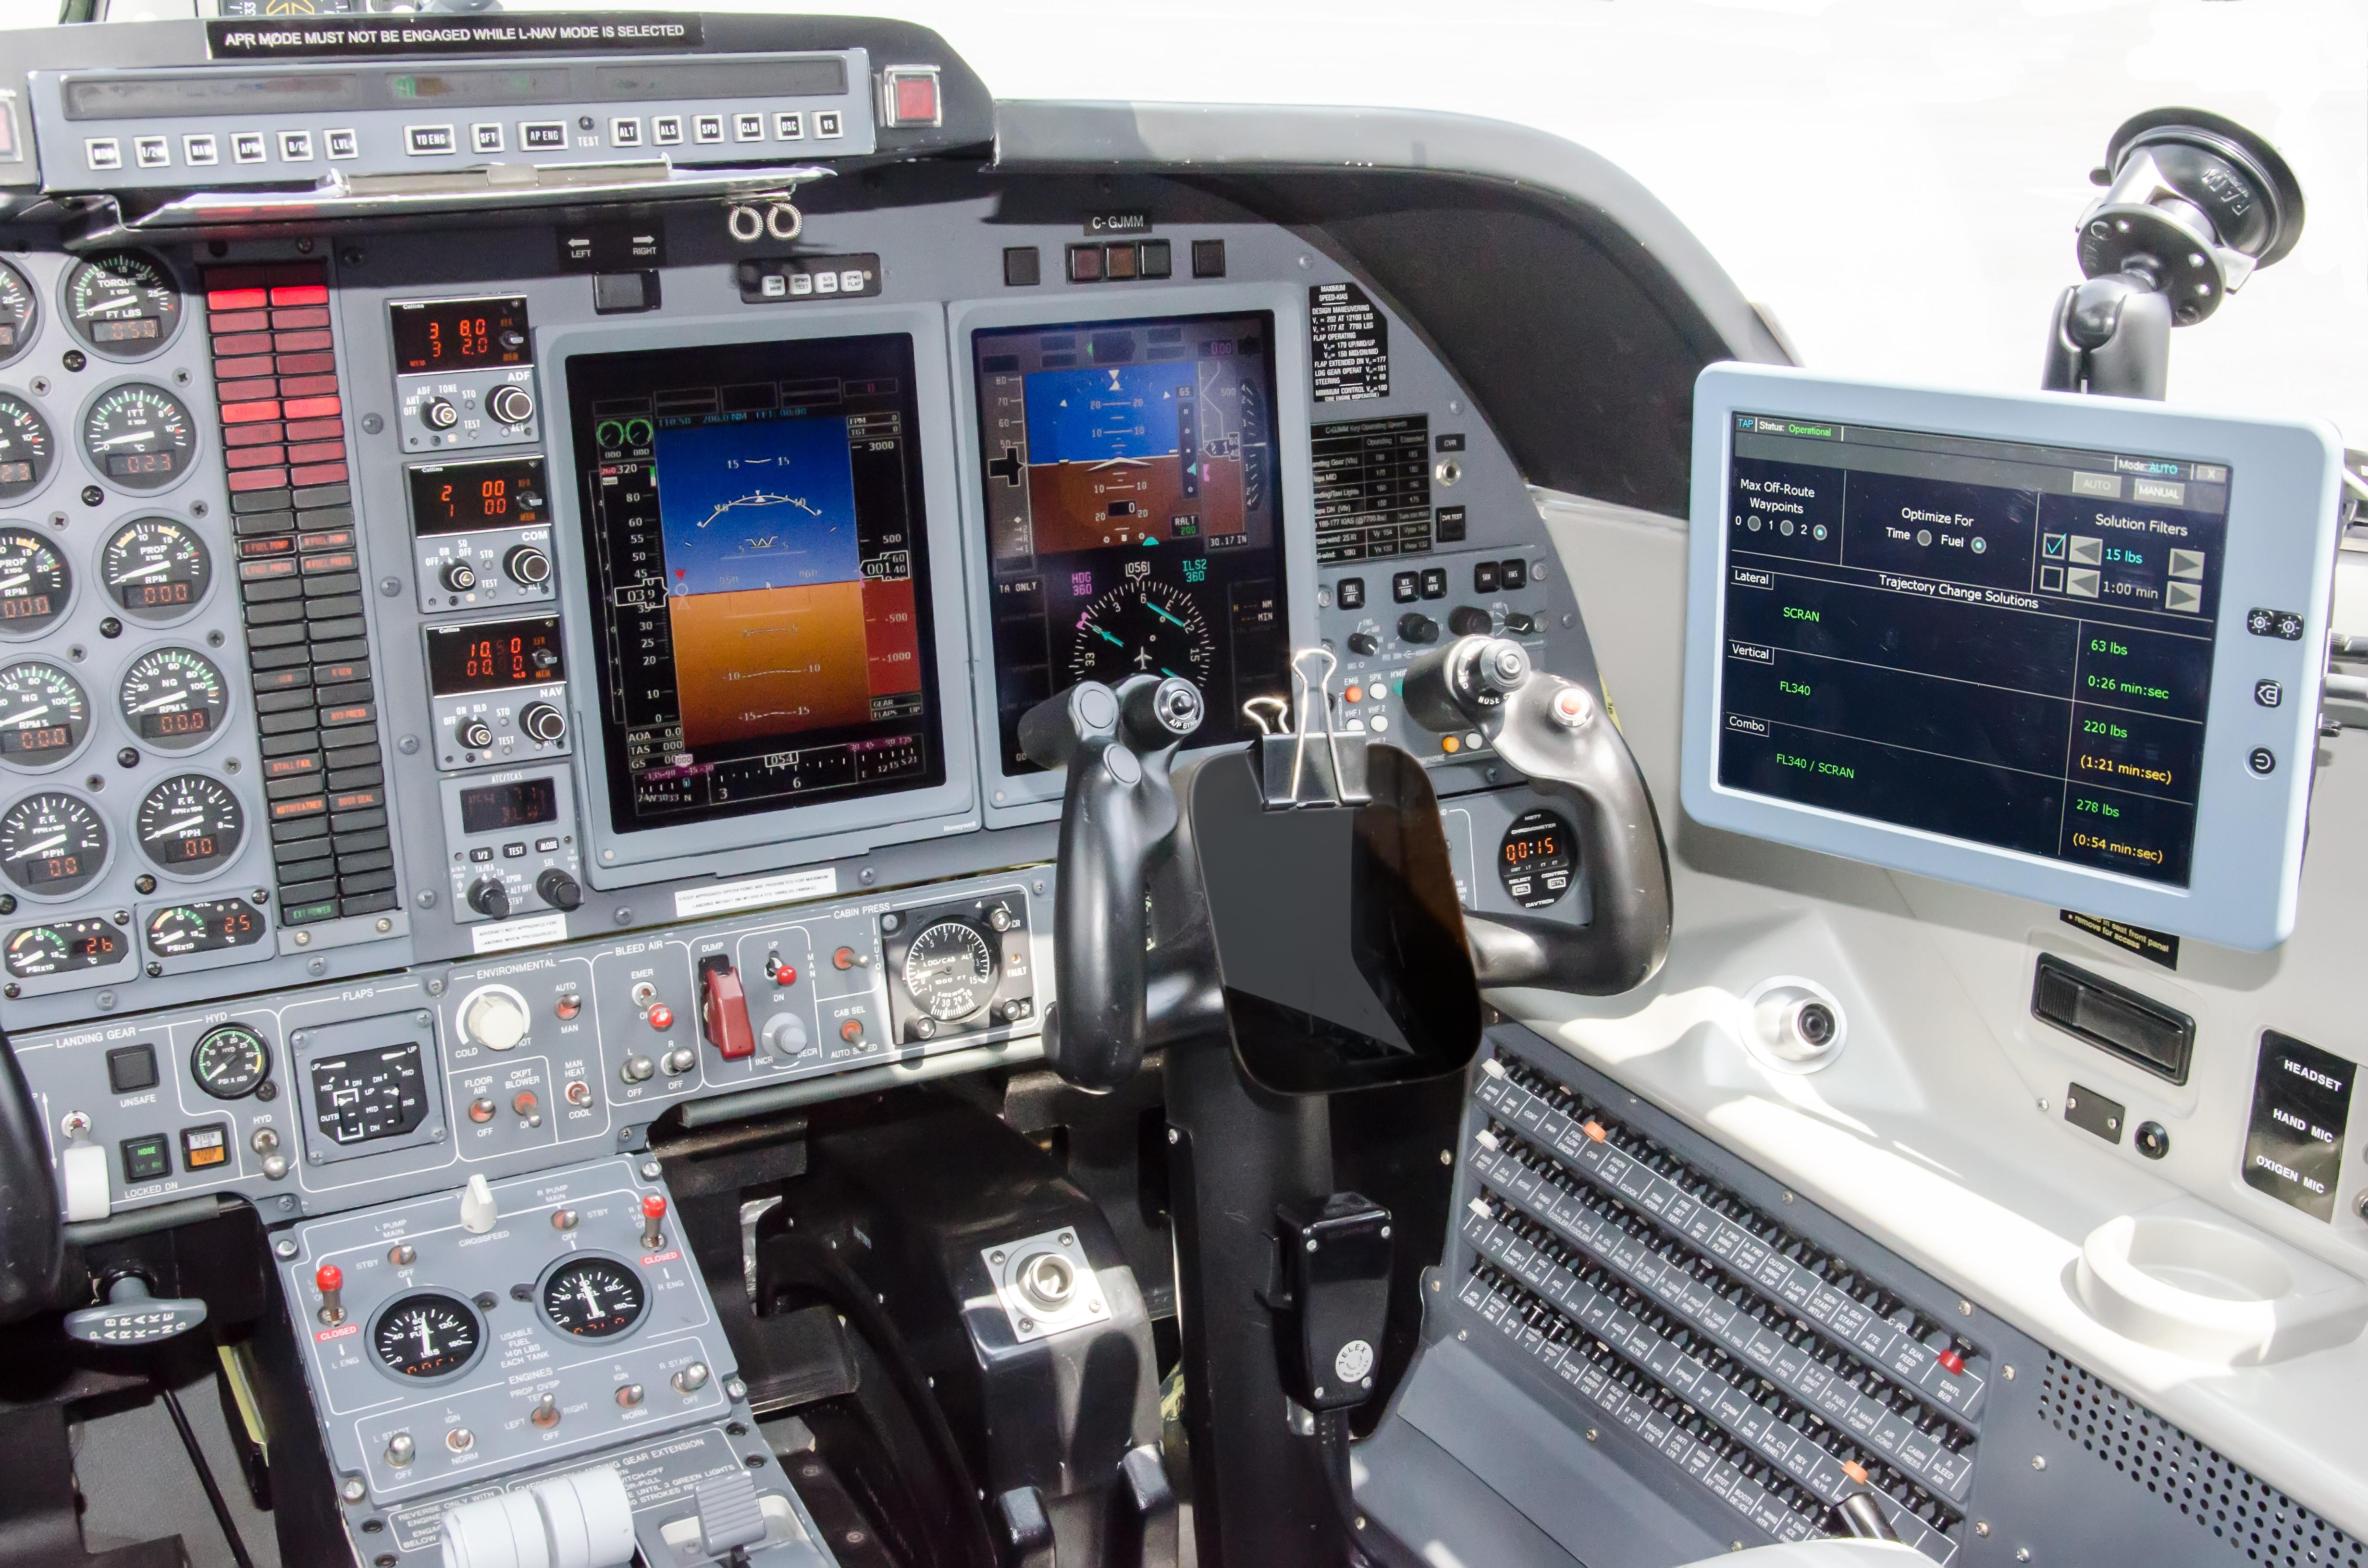 cockpit software could help pilots plot best path | nasa